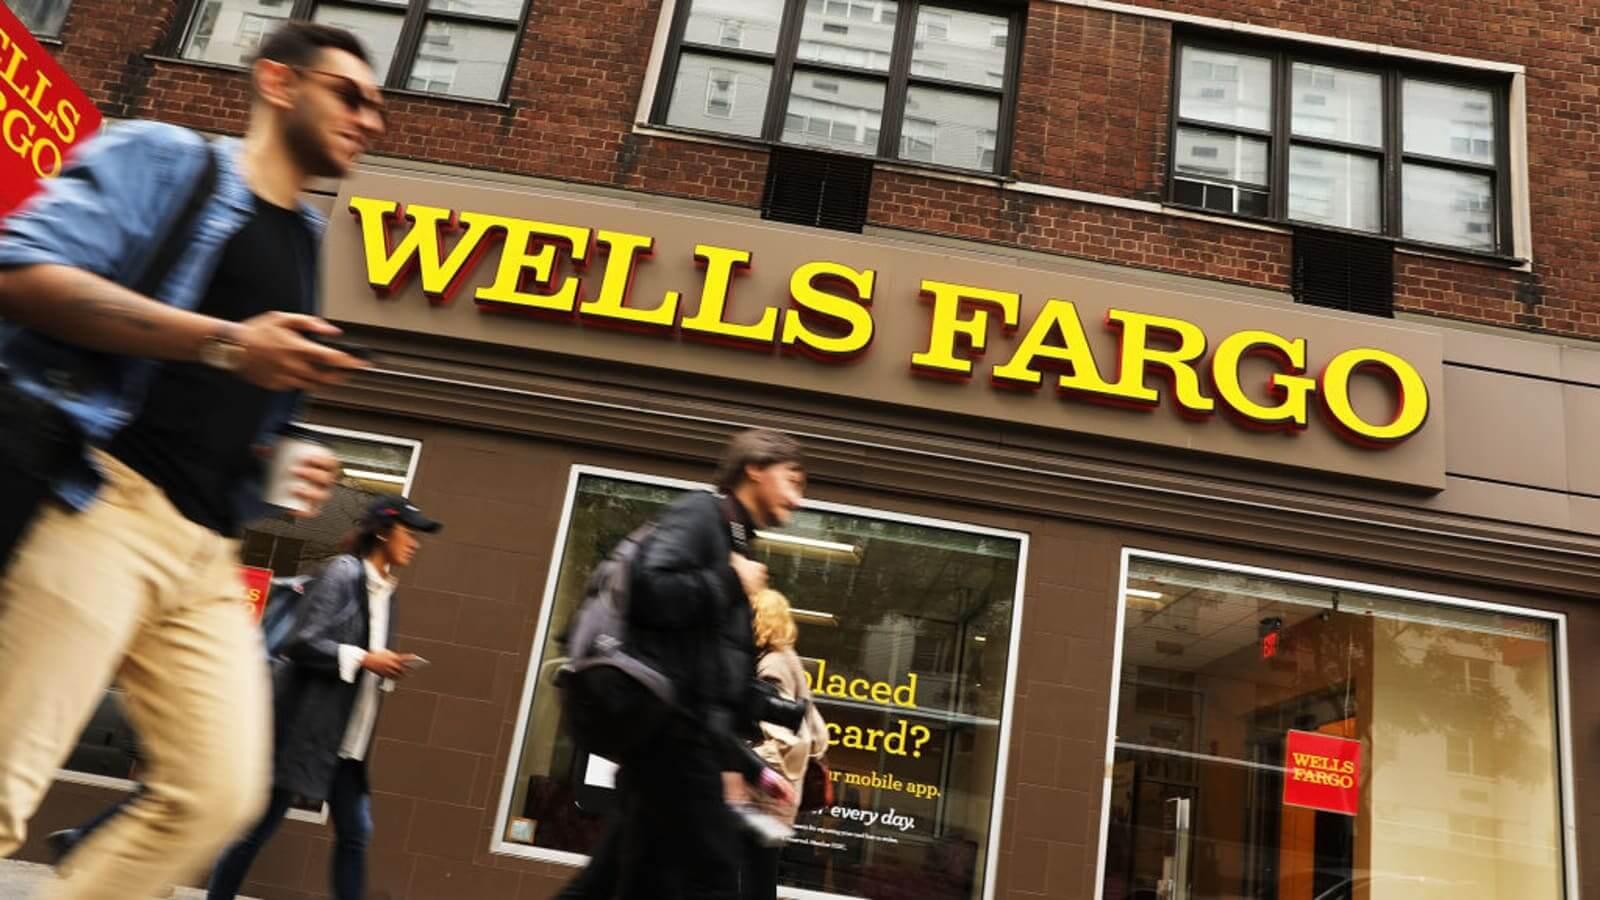 Wells Fargo allows remote work post-pandemic